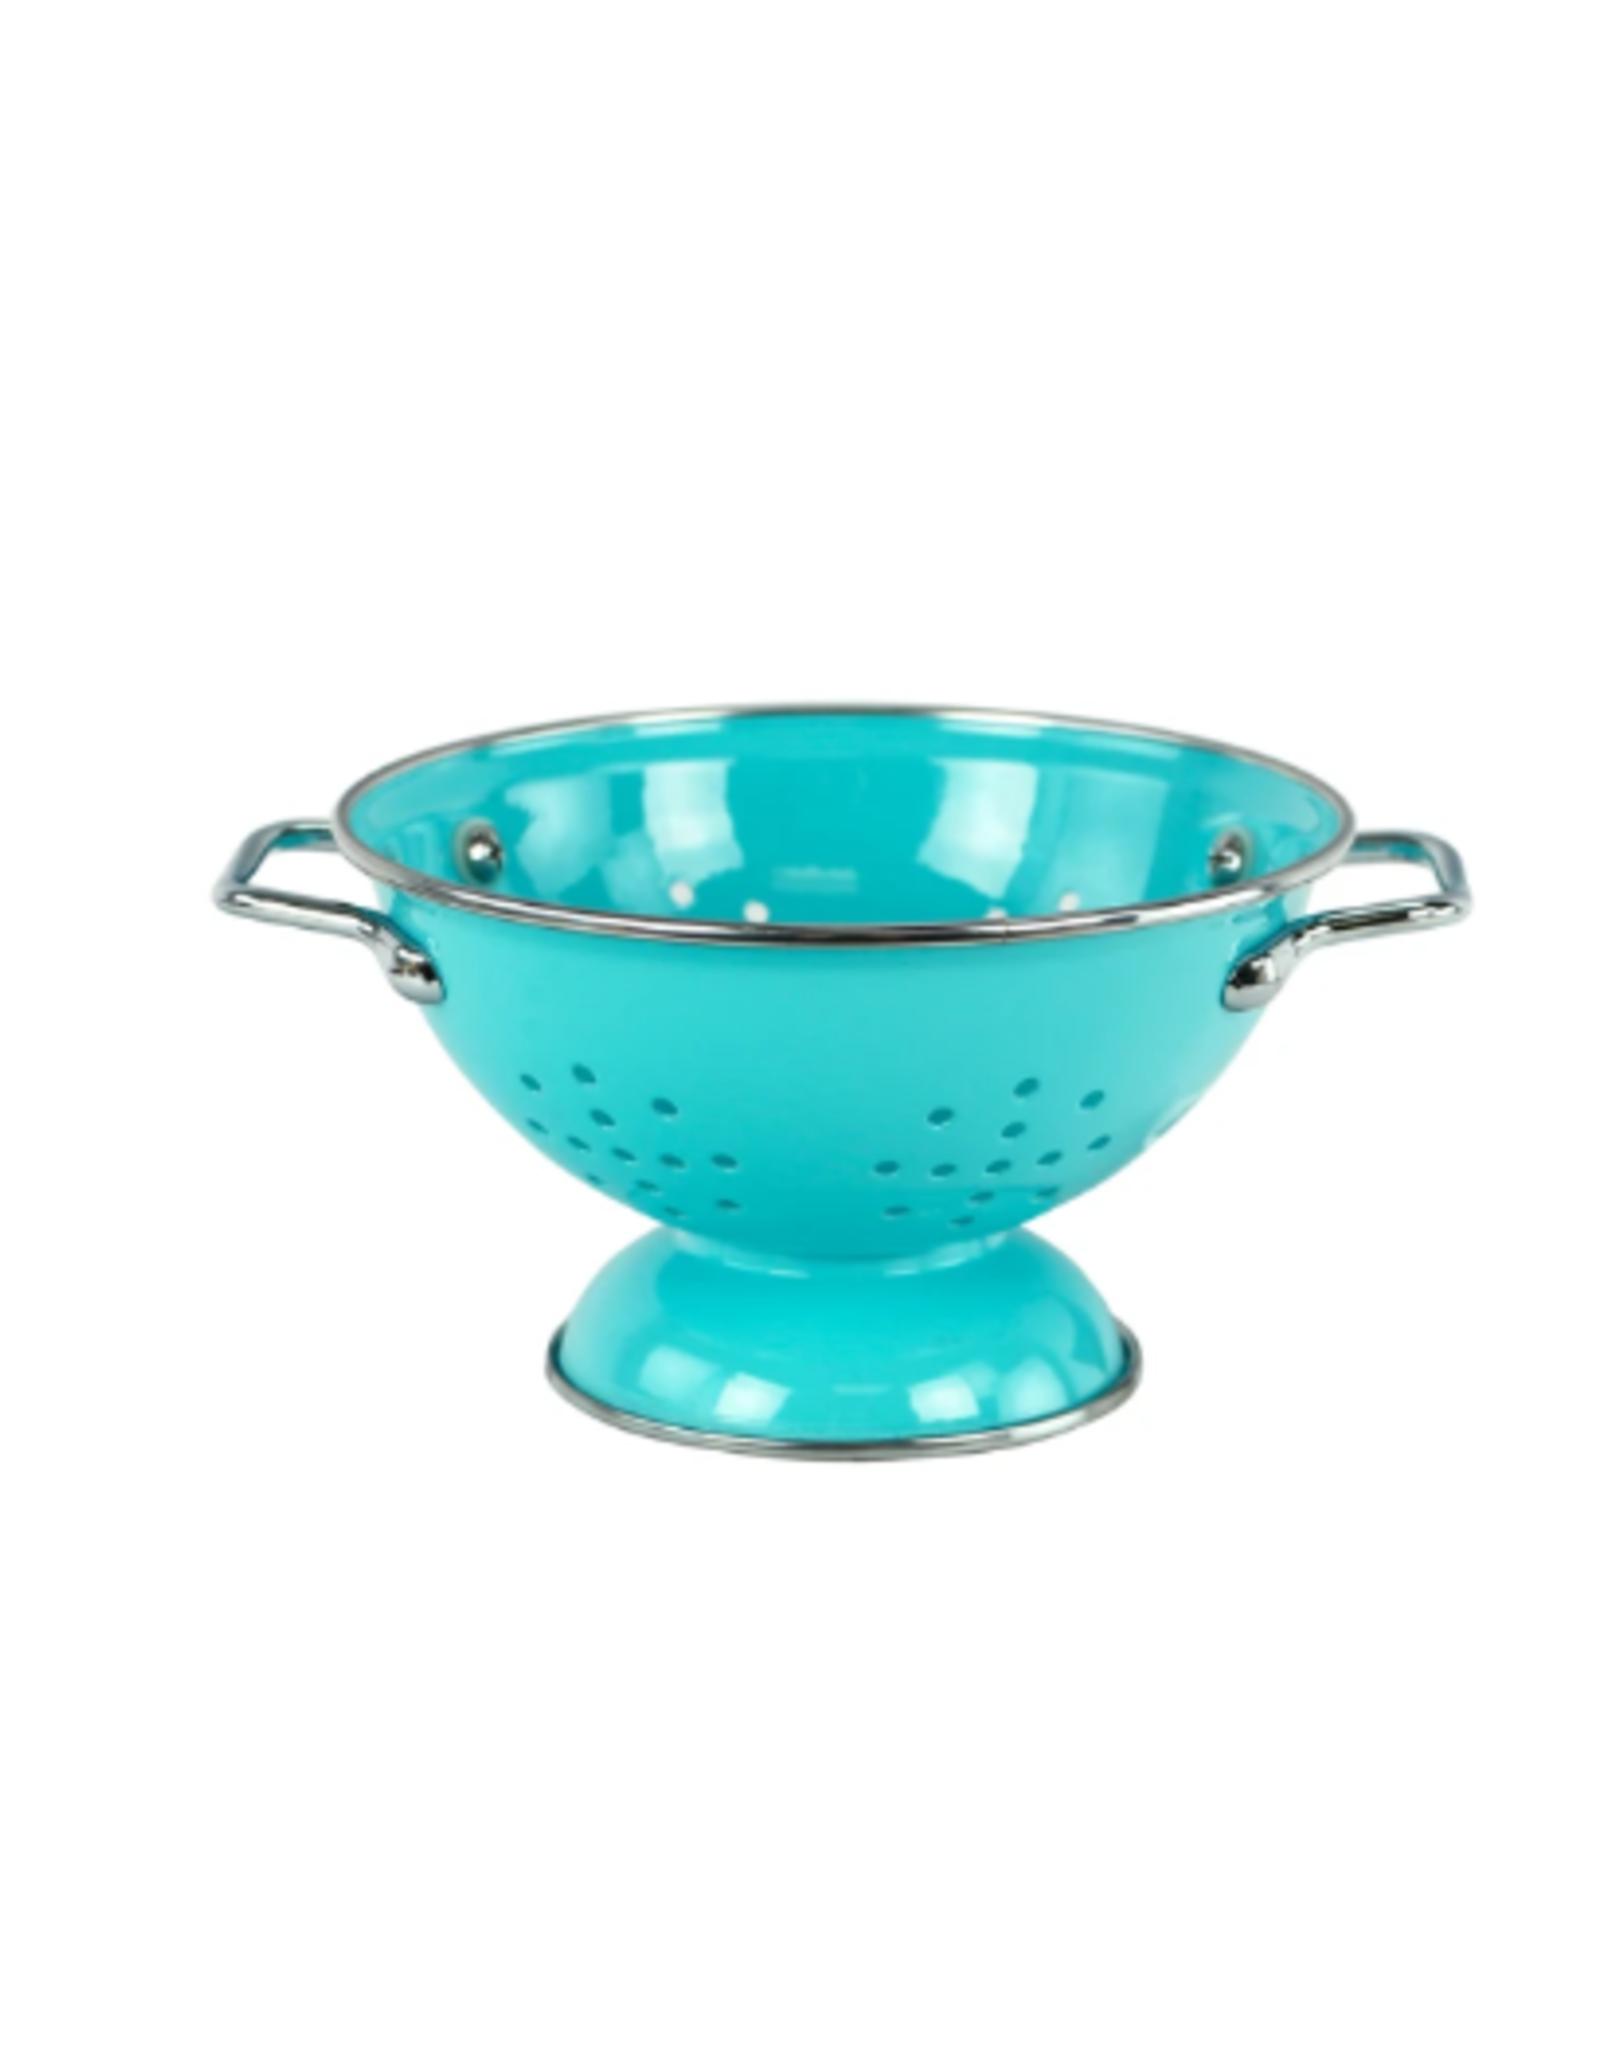 Reston Lloyd Colander, 5Qt, Turquoise